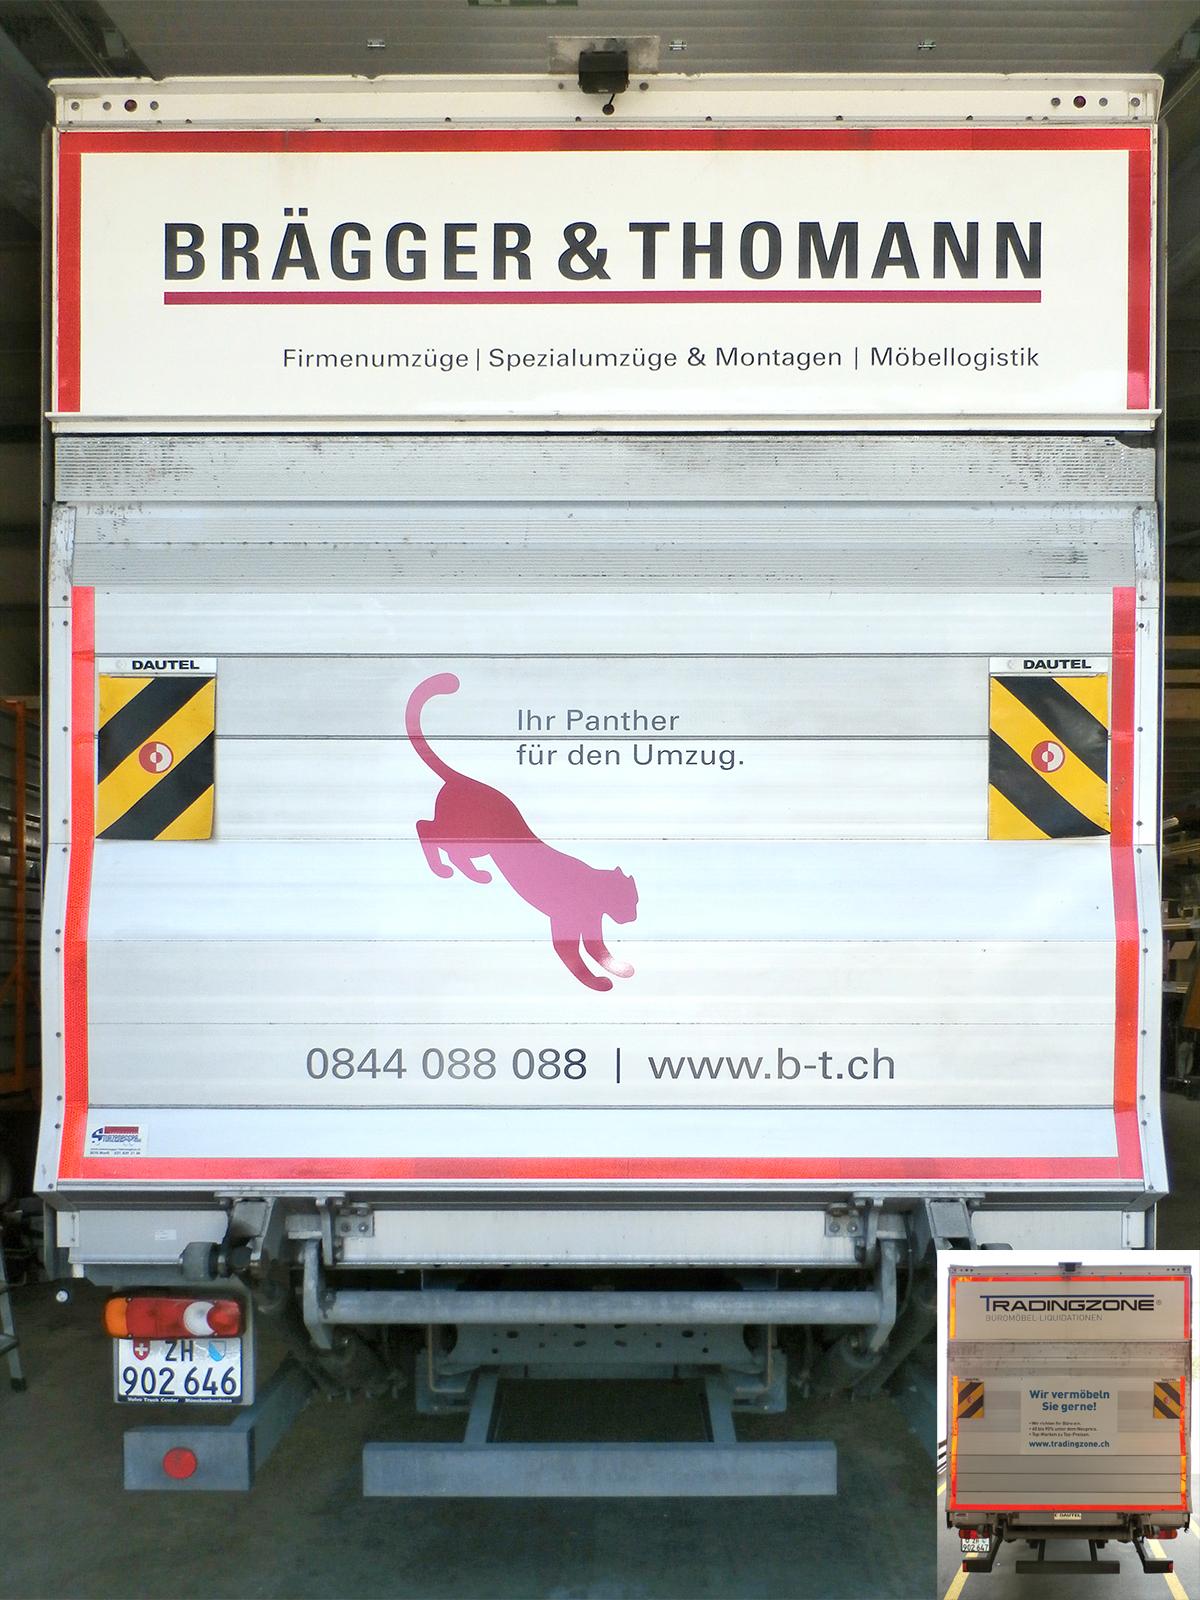 LKW_Umbeschriftung Brägger & Thomann Beifahrerseite